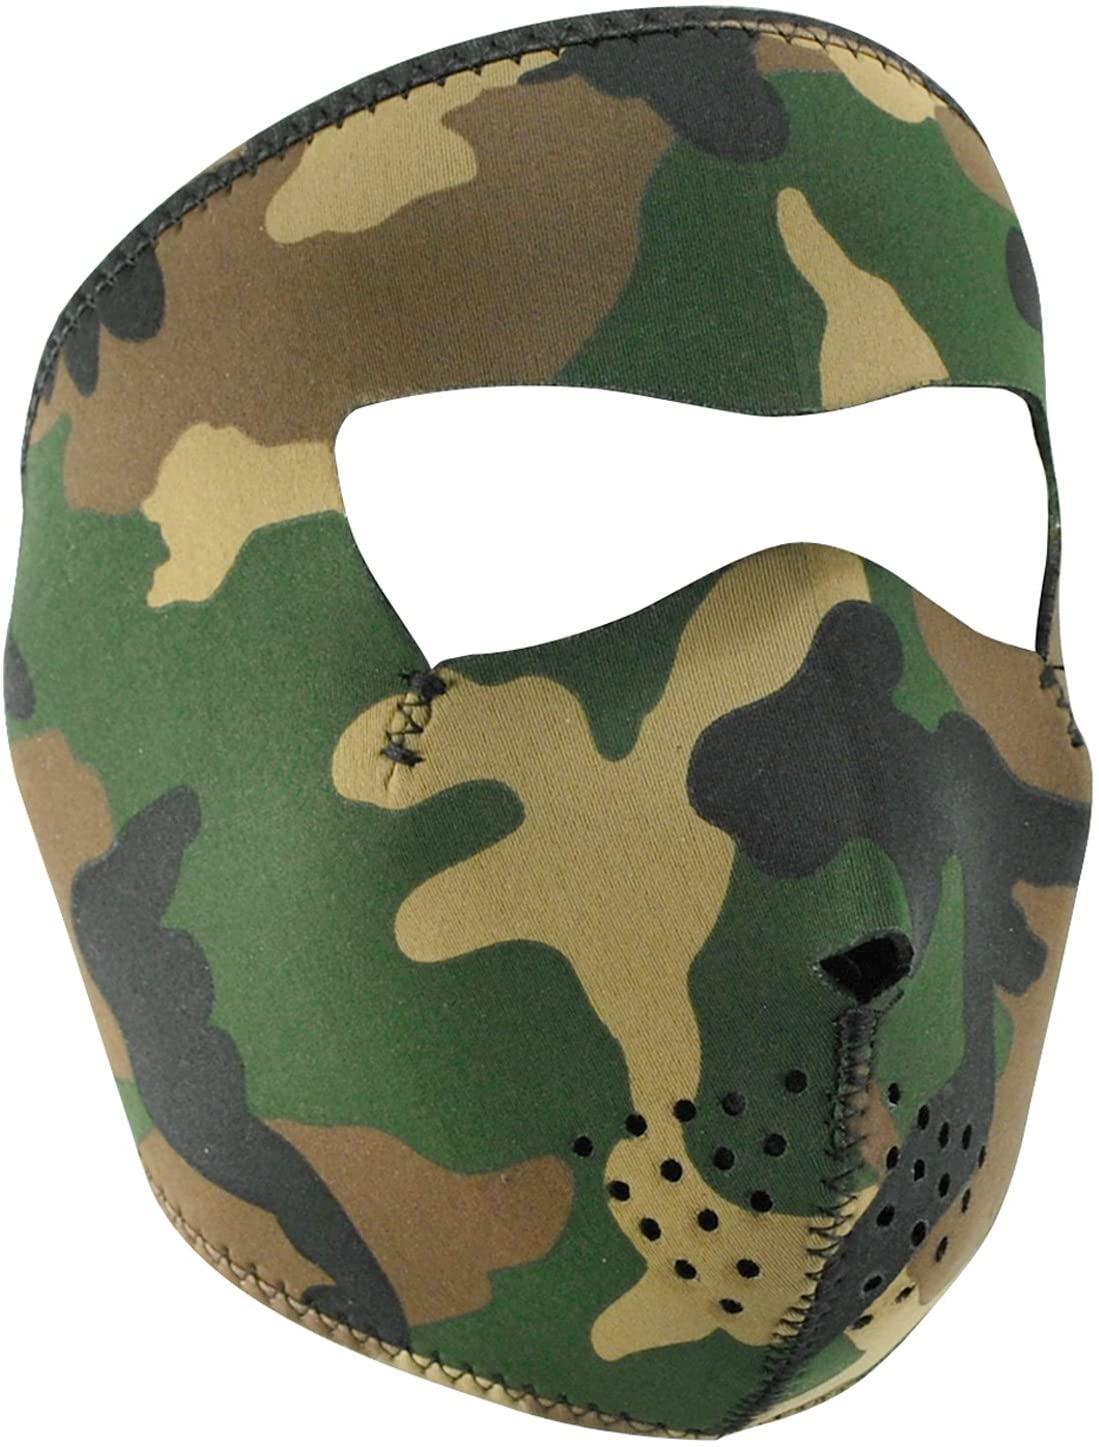 Zanheadgear WNFM118 Woodland Camouflage Neoprene Face Mask, Adult/Unisex